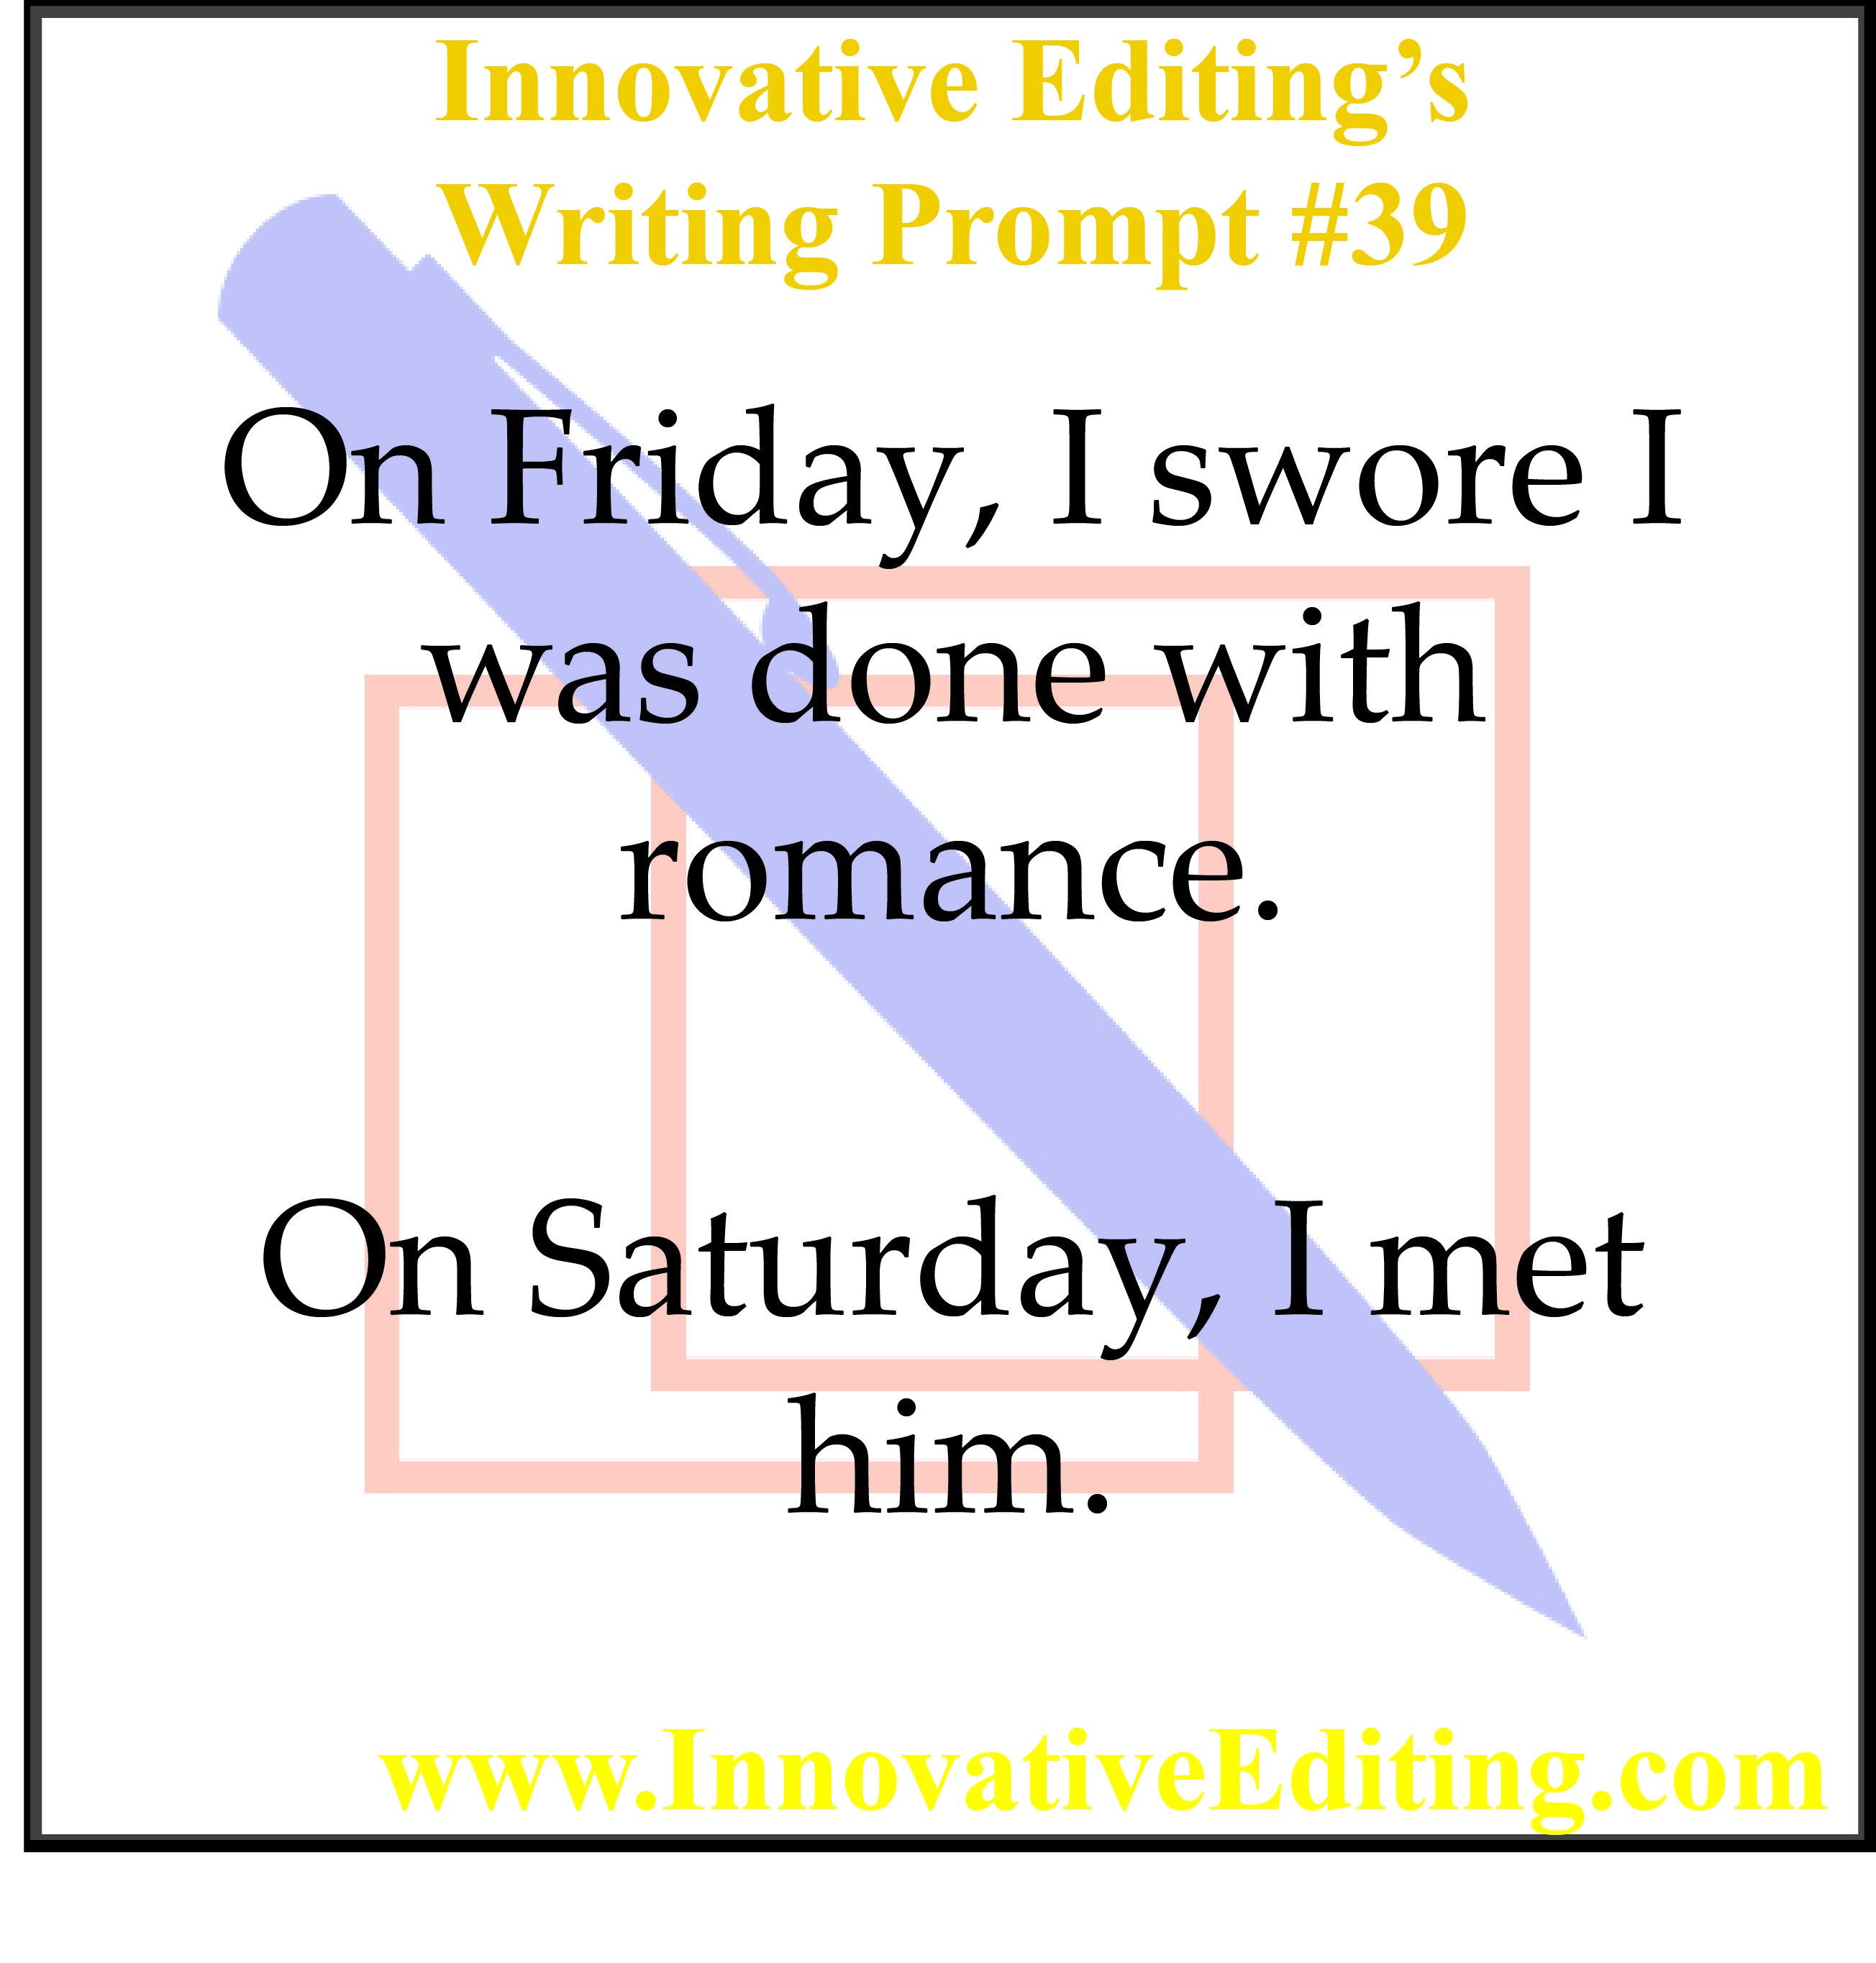 Full Service Copyeditor Lancaster Pa Innovative Editing Creative Writing Prompts Writing Novel Writing